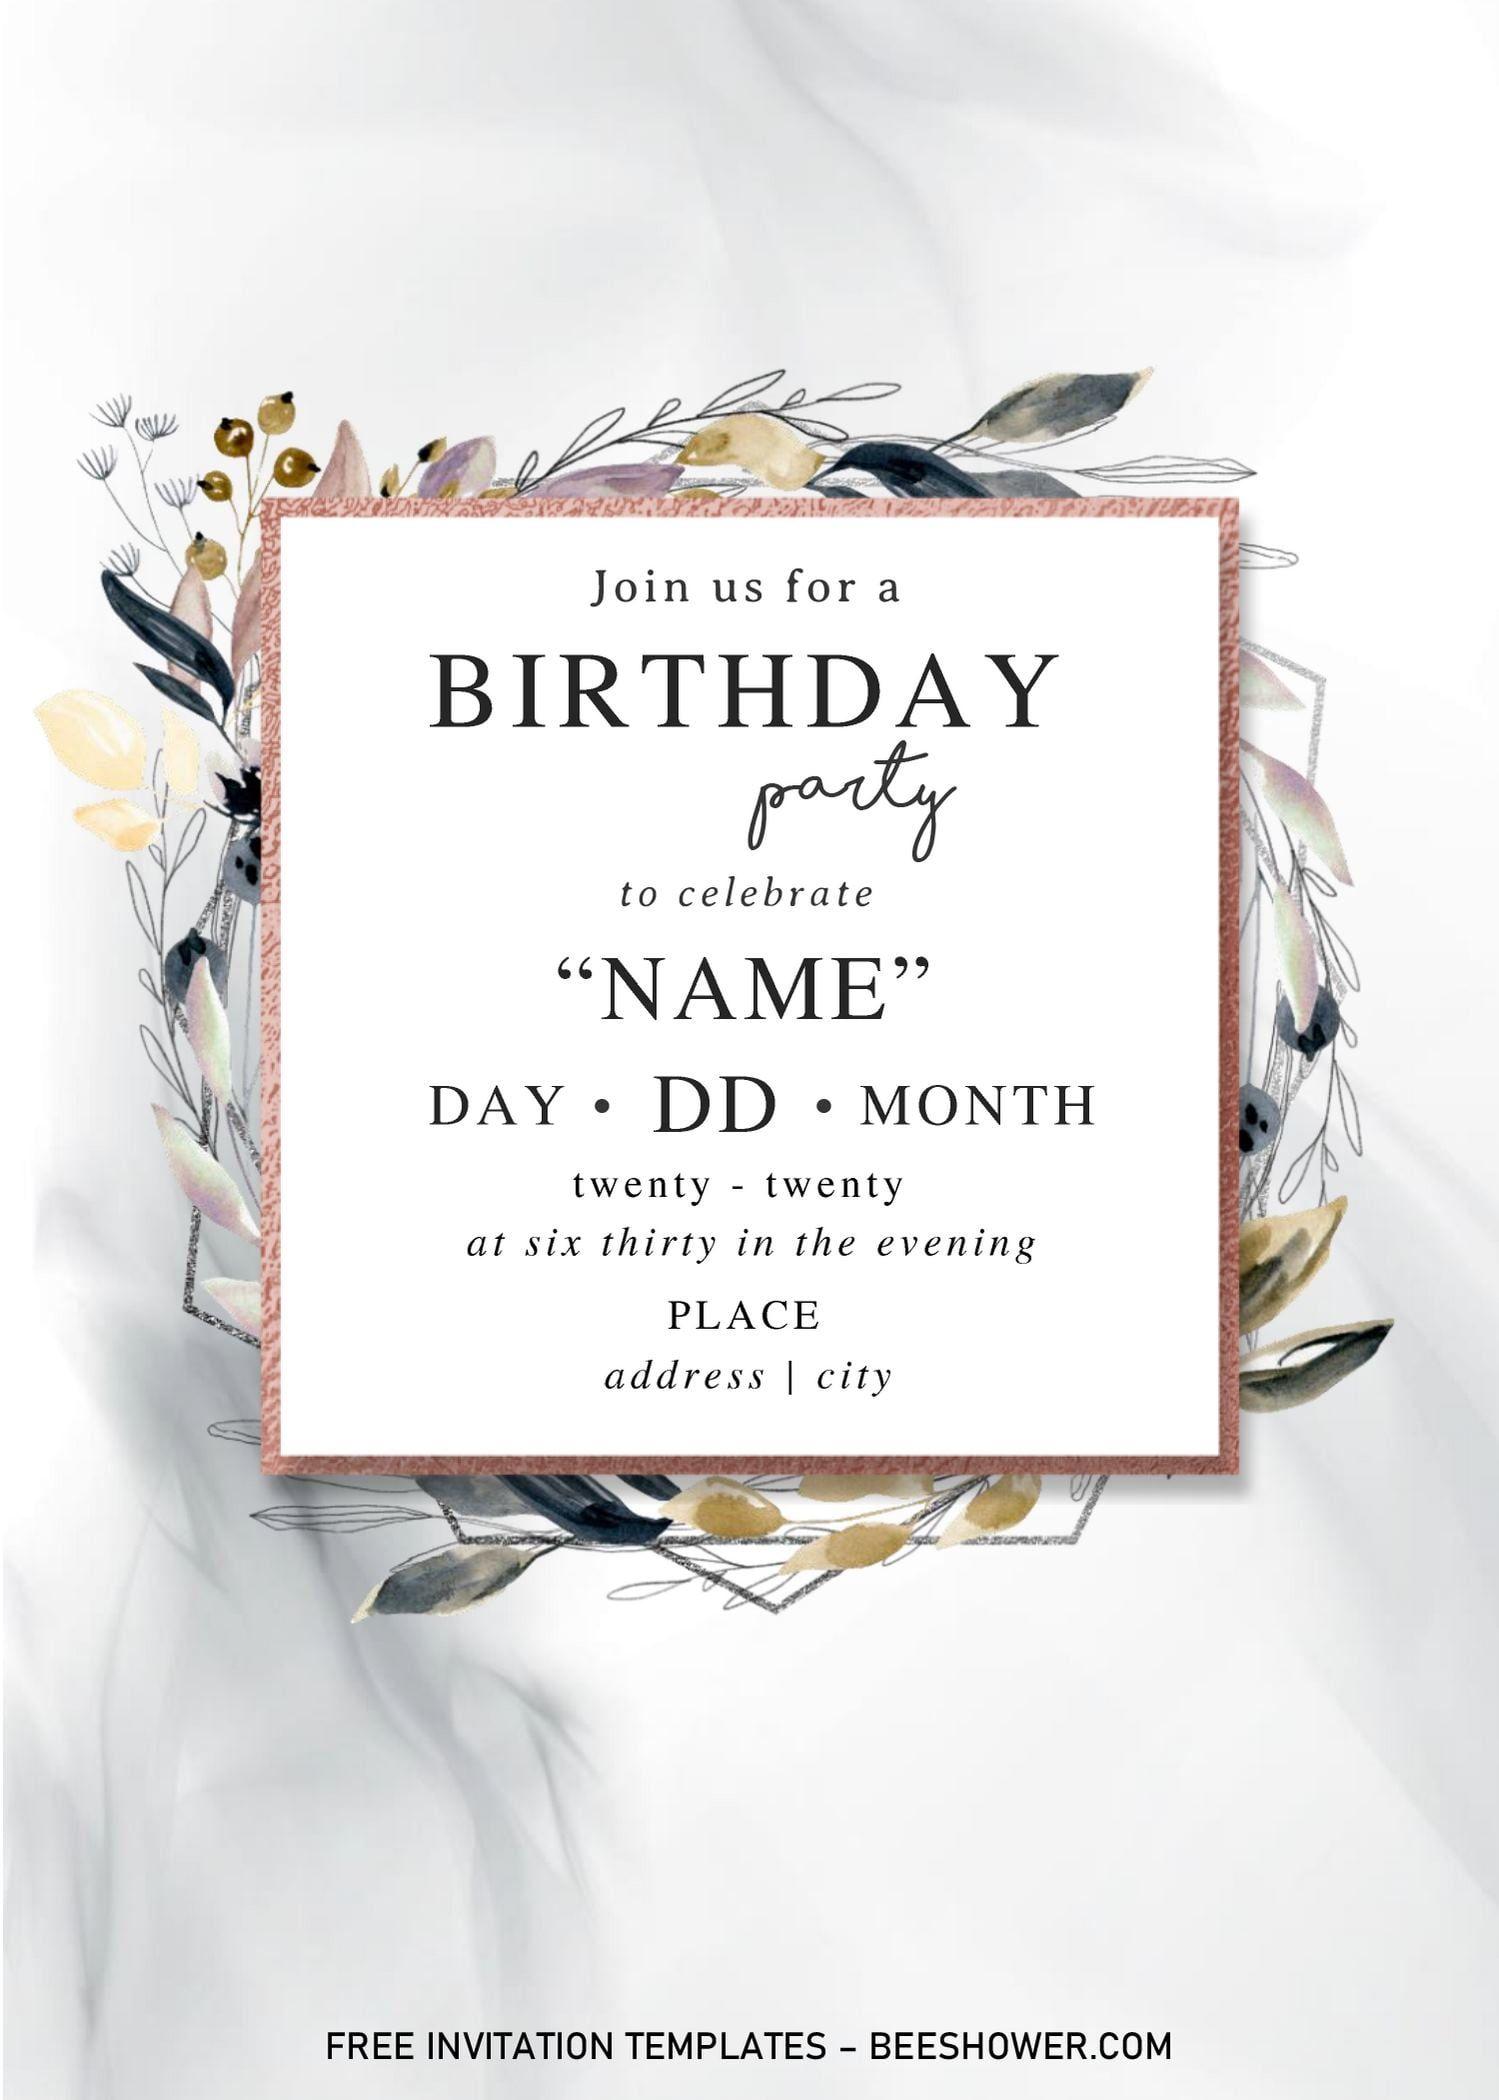 Festive Floral Baby Shower Invitation Templates Editable With Microso Baby Shower Invitation Templates Floral Baby Shower Invitations Baby Shower Invitations